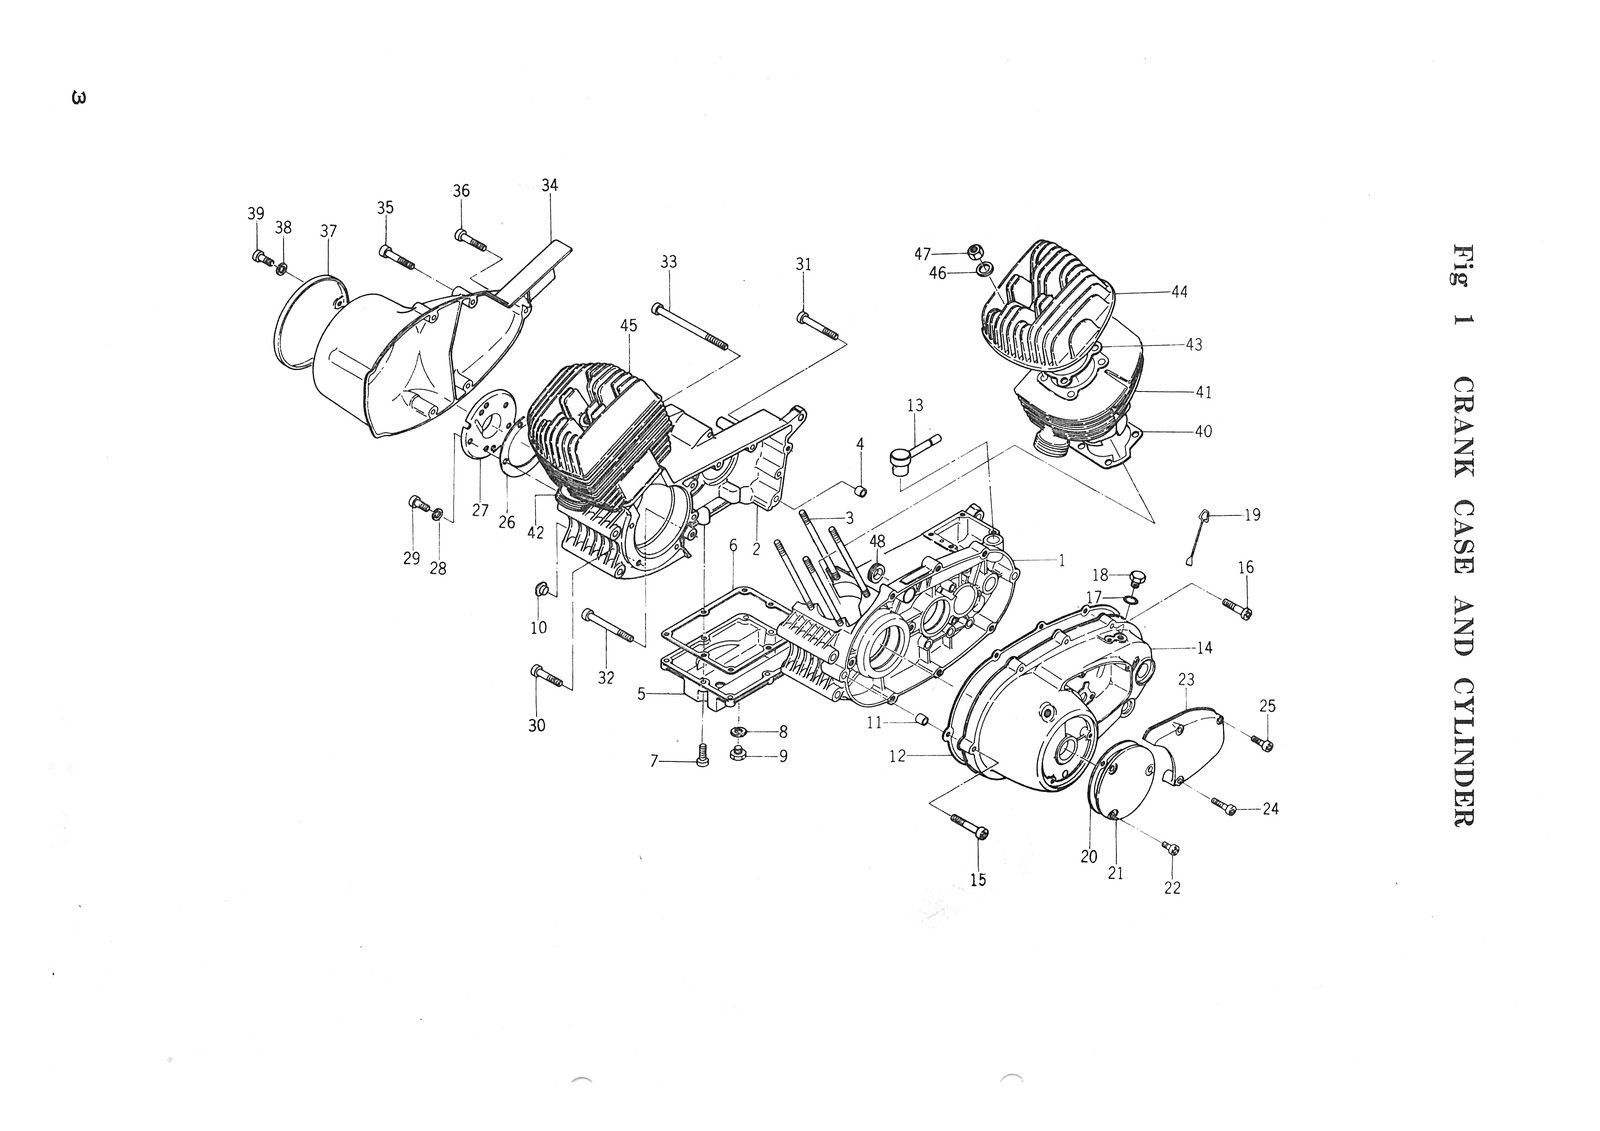 hight resolution of yamaha parts manual yds3 yds3c yds3 c 1964 1965 1966 spares catalog list ebay